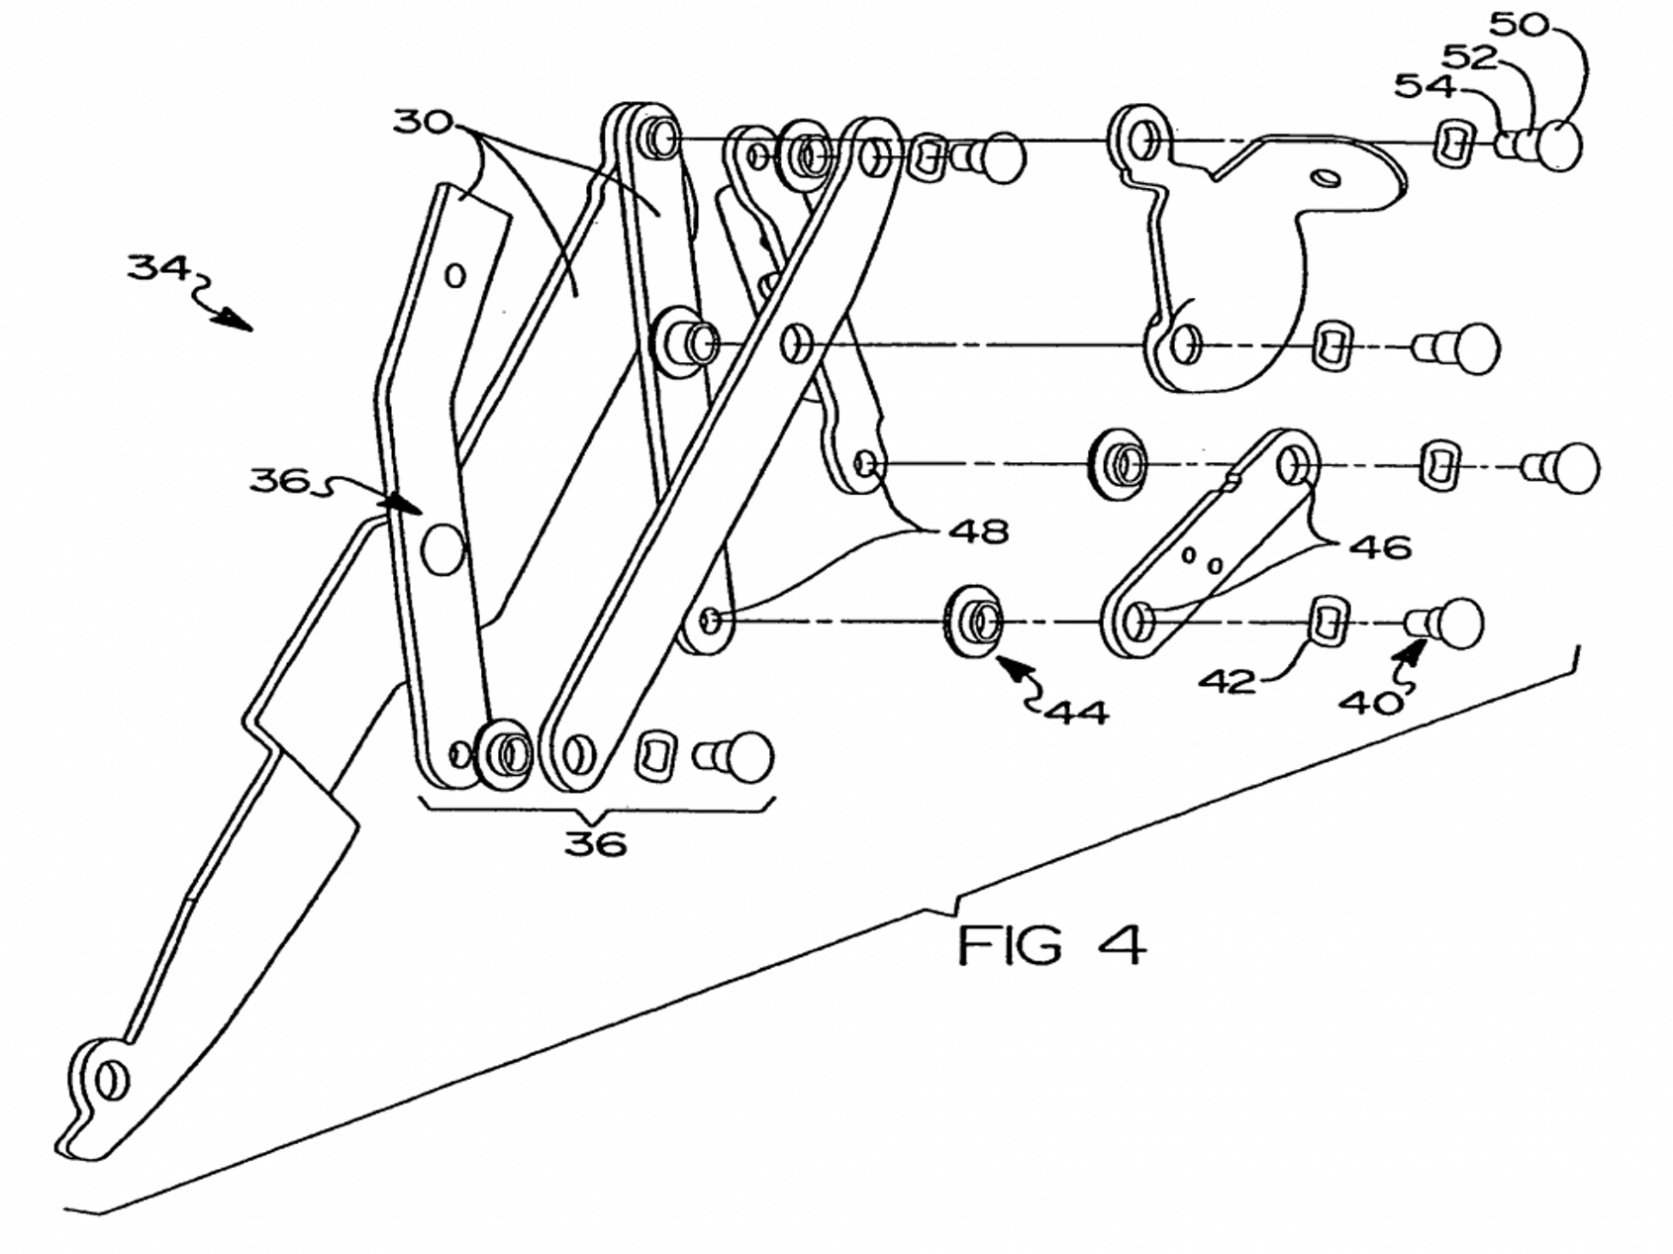 [DIAGRAM] Motor Wiring Diagram For Recliner FULL Version